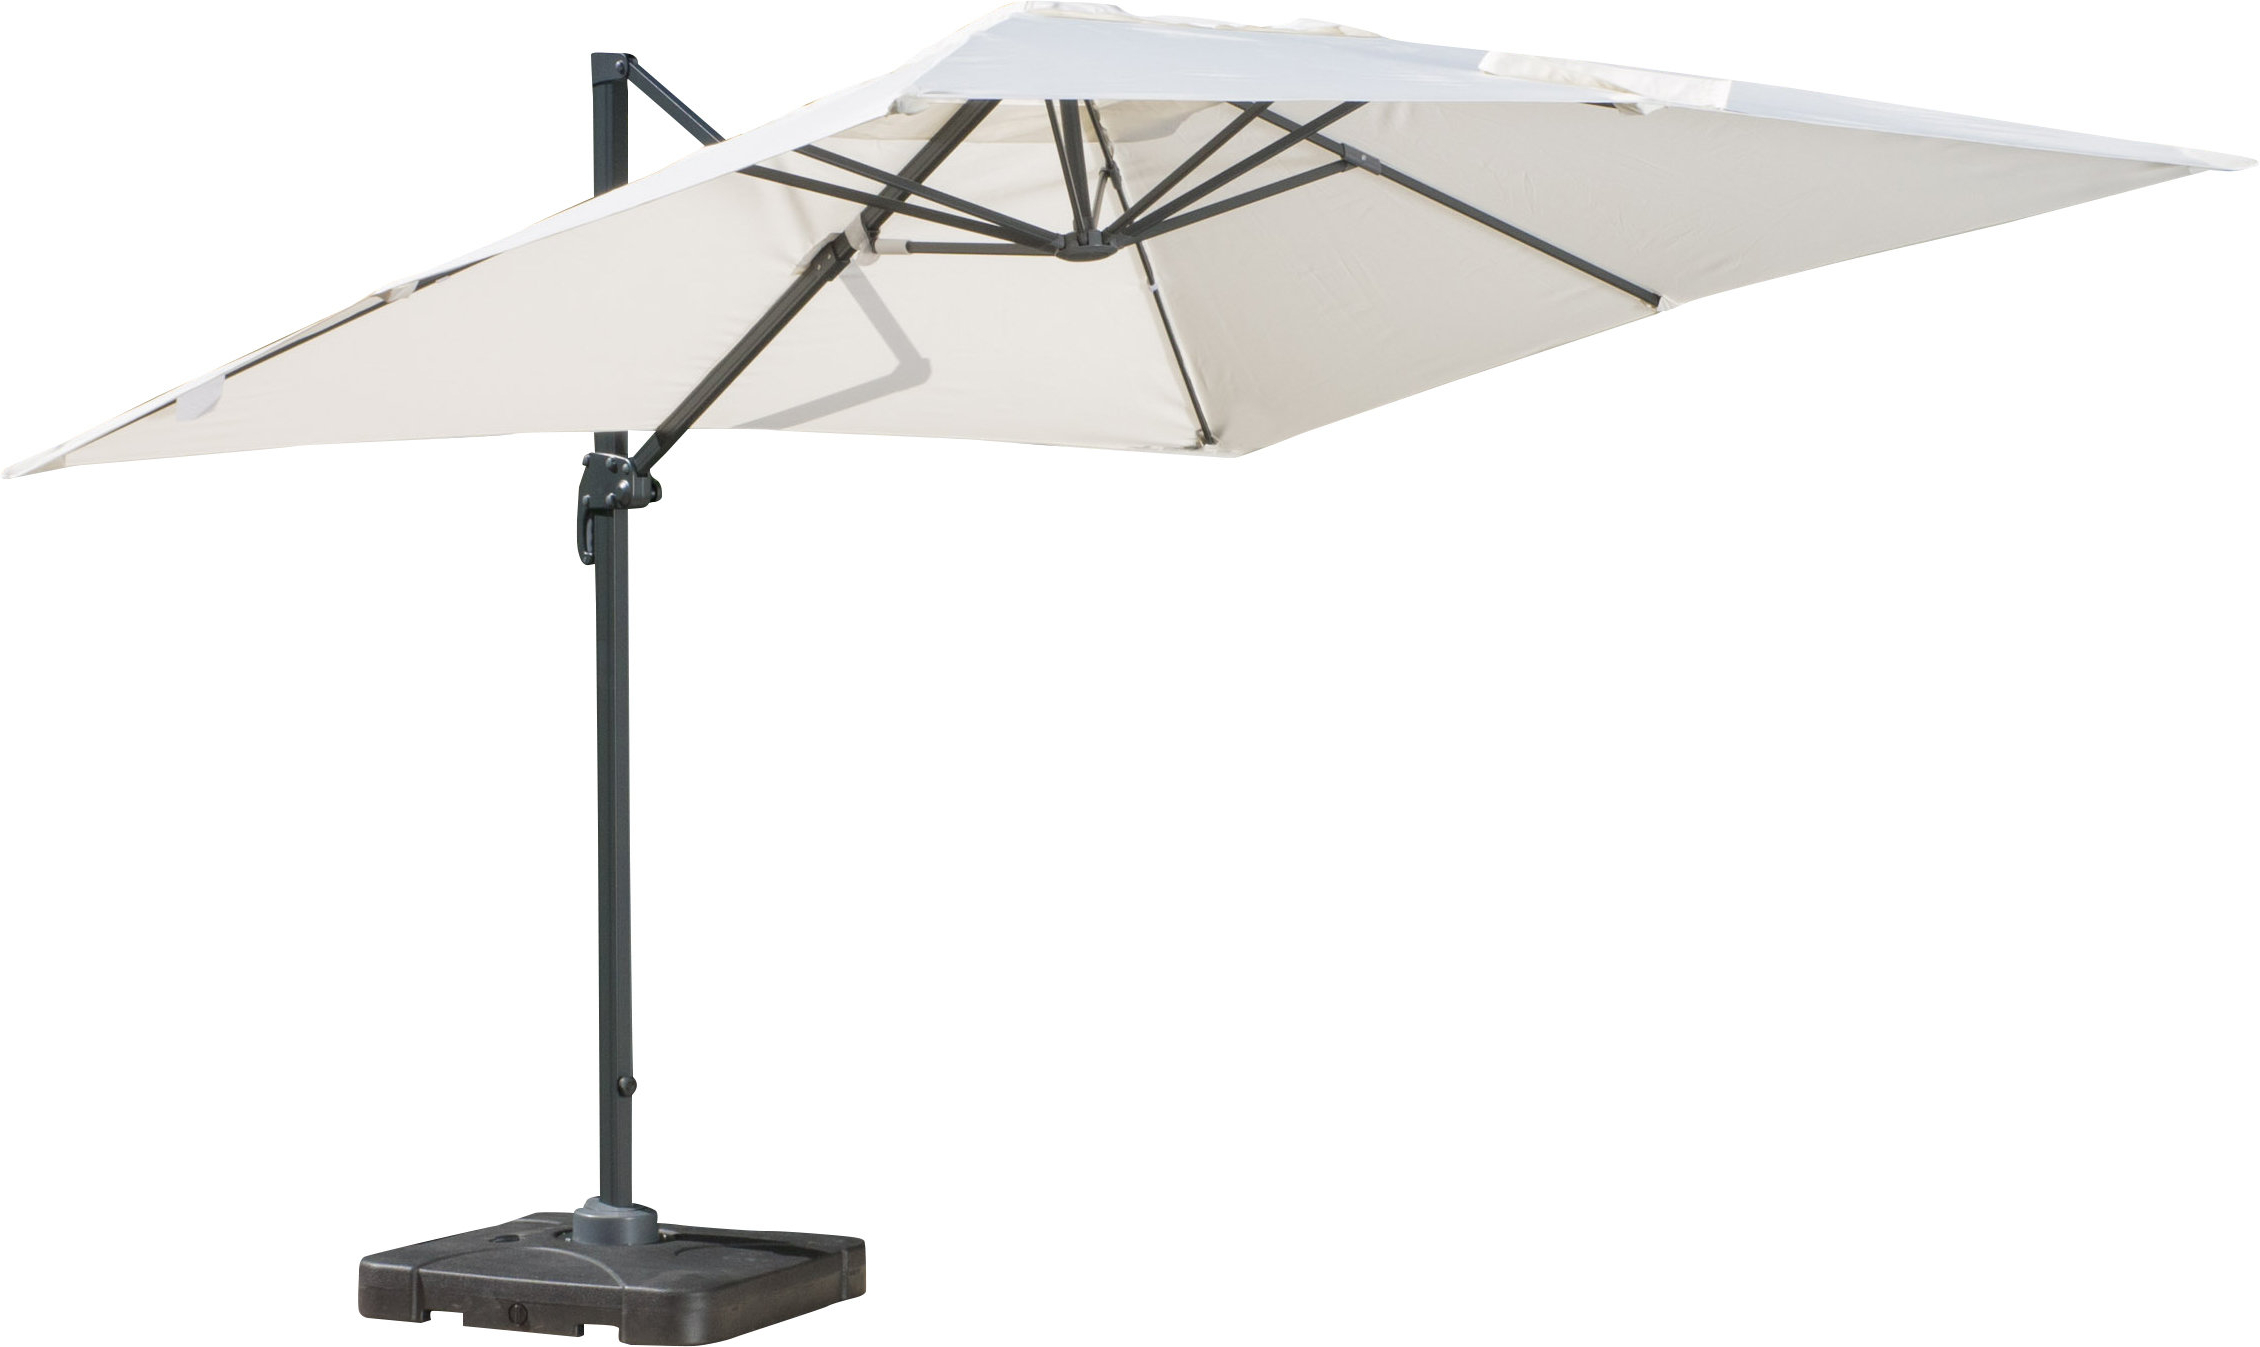 Boracay 10' Square Cantilever Umbrella Throughout Most Recent Anna Cantilever Umbrellas (View 9 of 20)